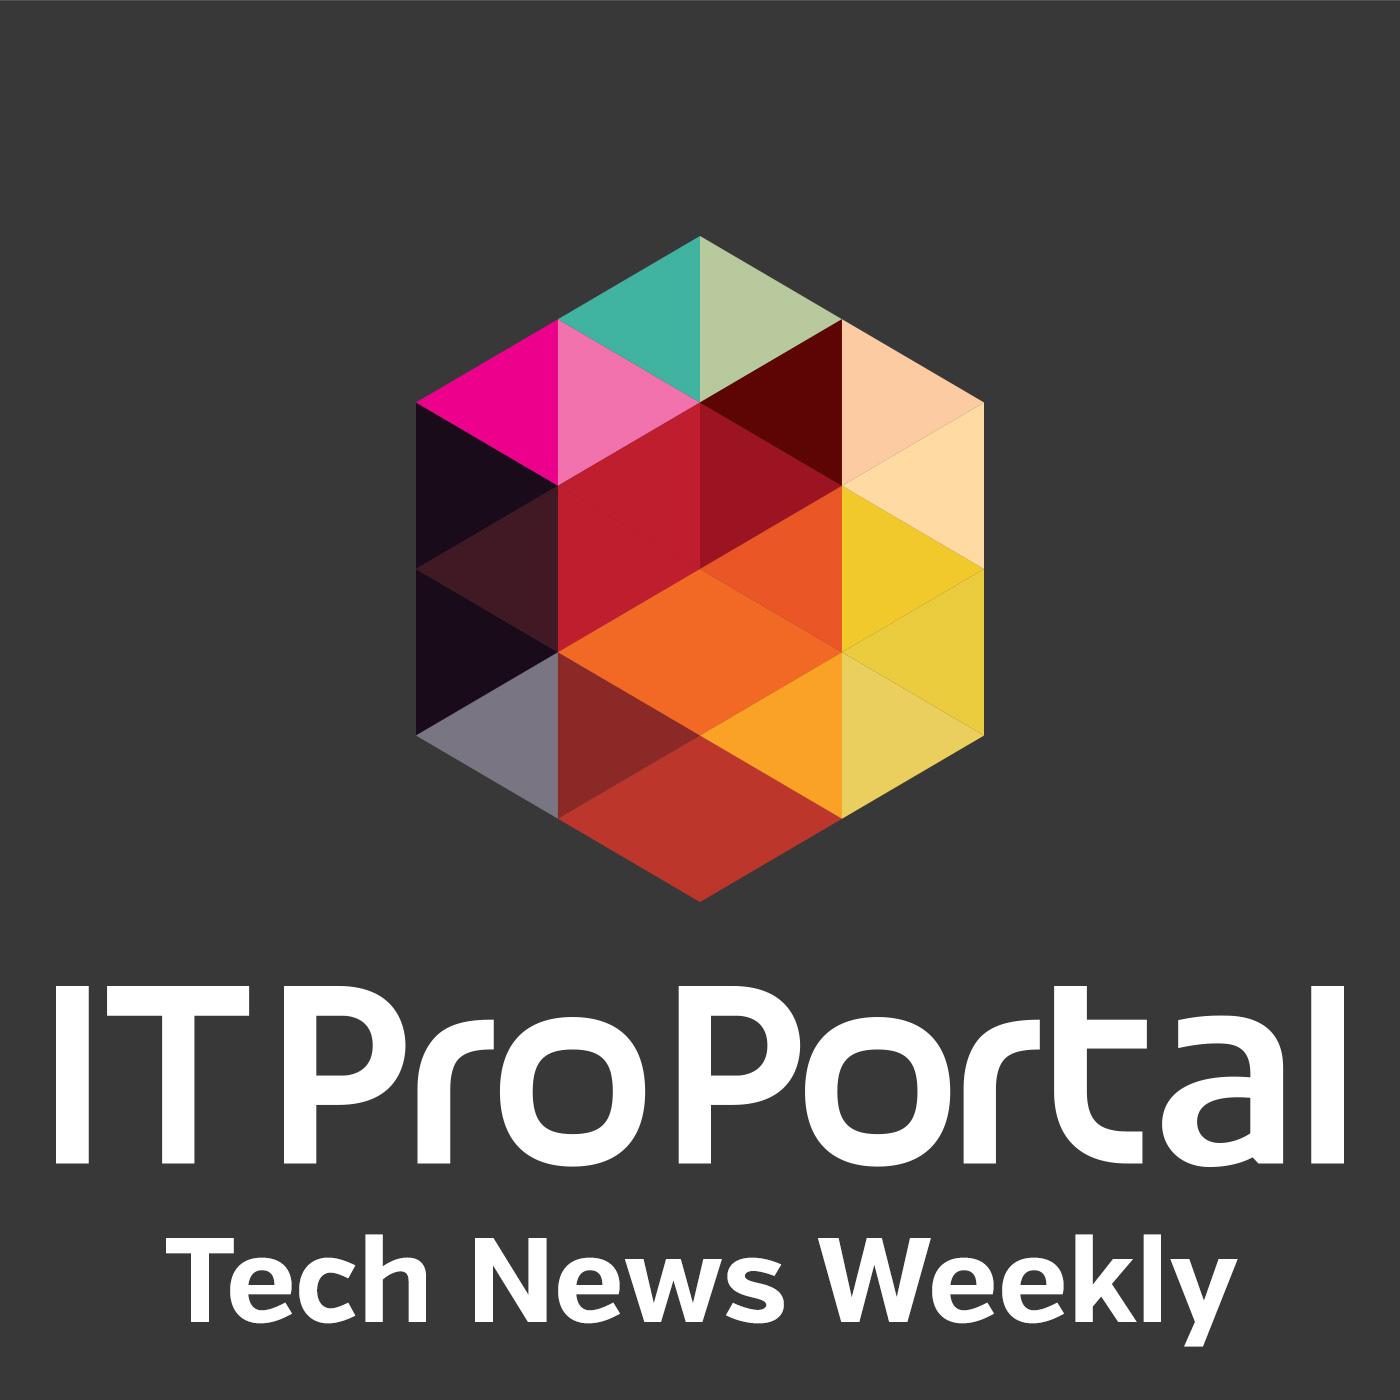 ITProPortal_technewsweekly.jpg